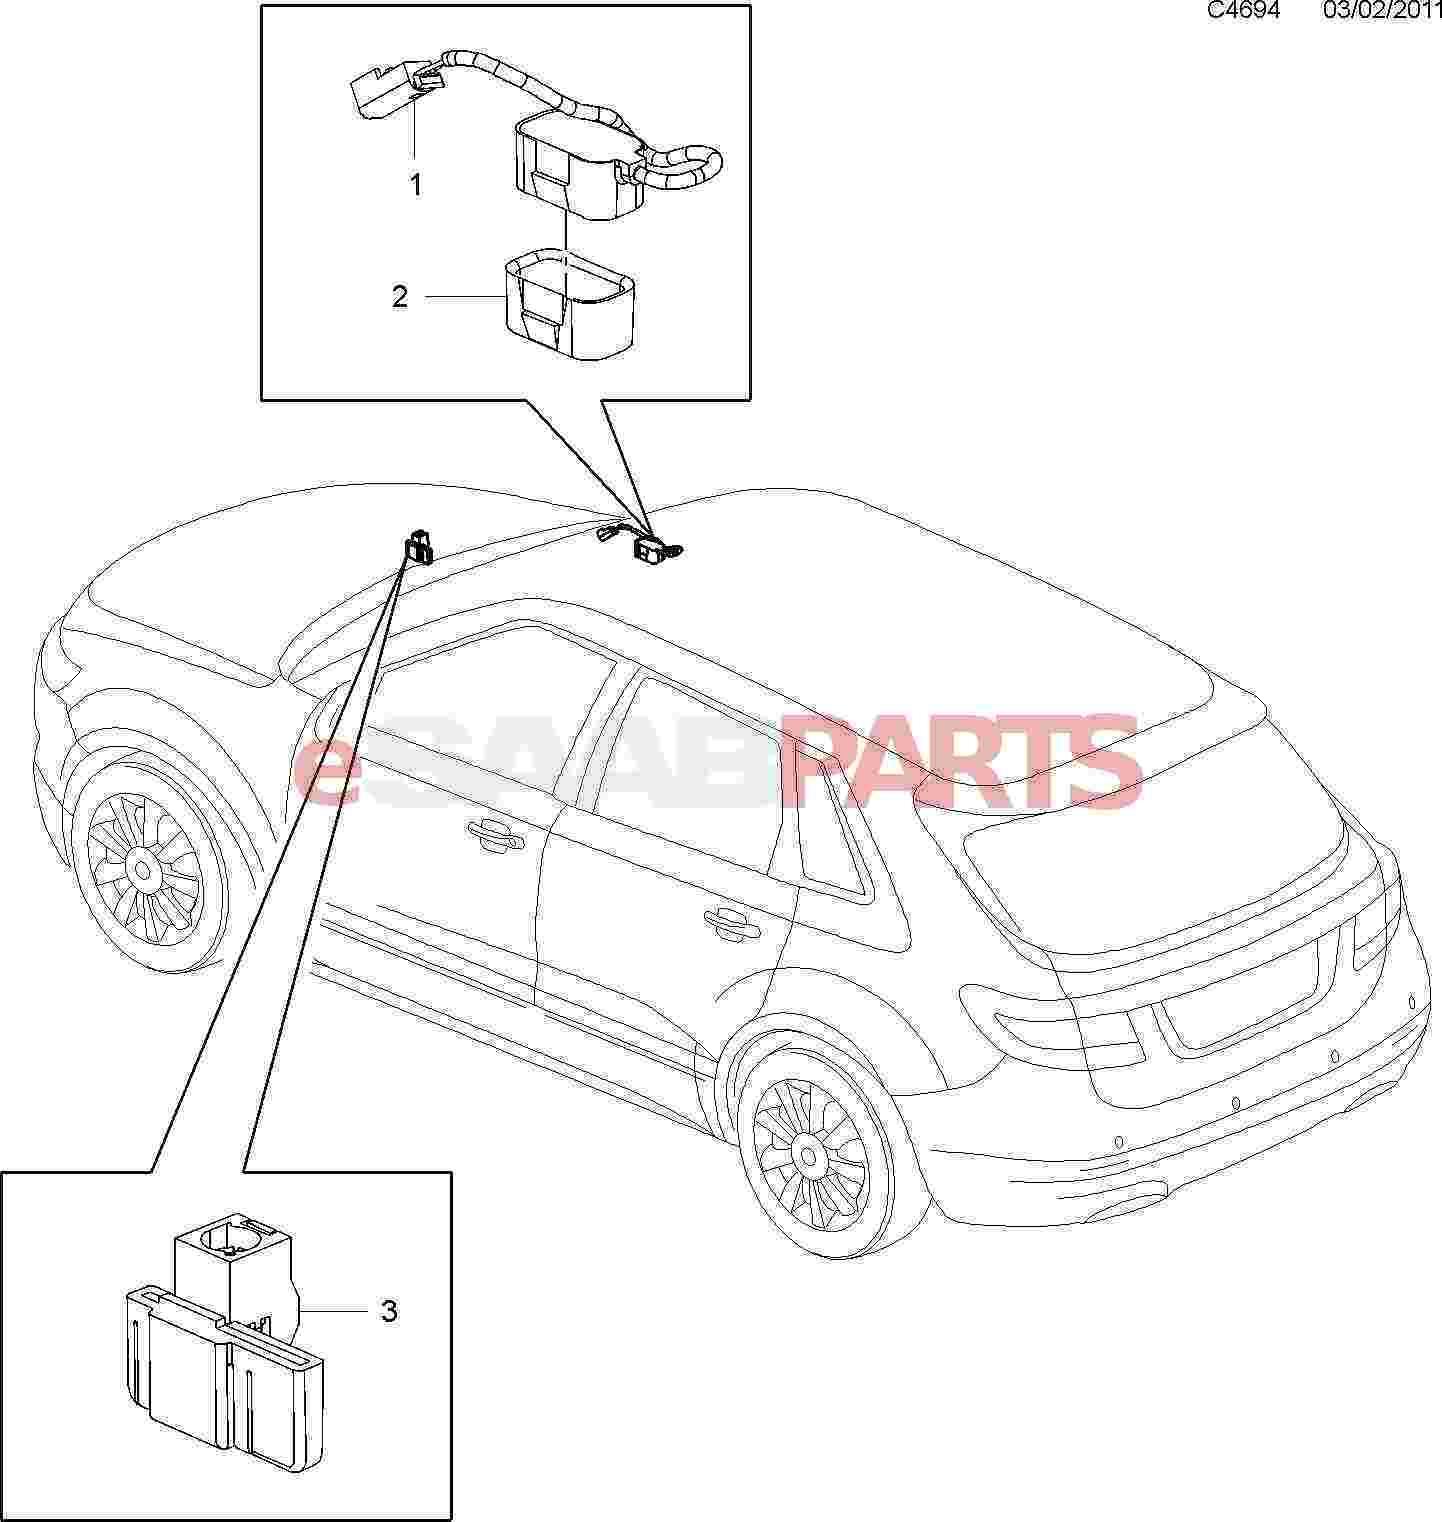 Saab Bluetooth Wireless Communication Antenna